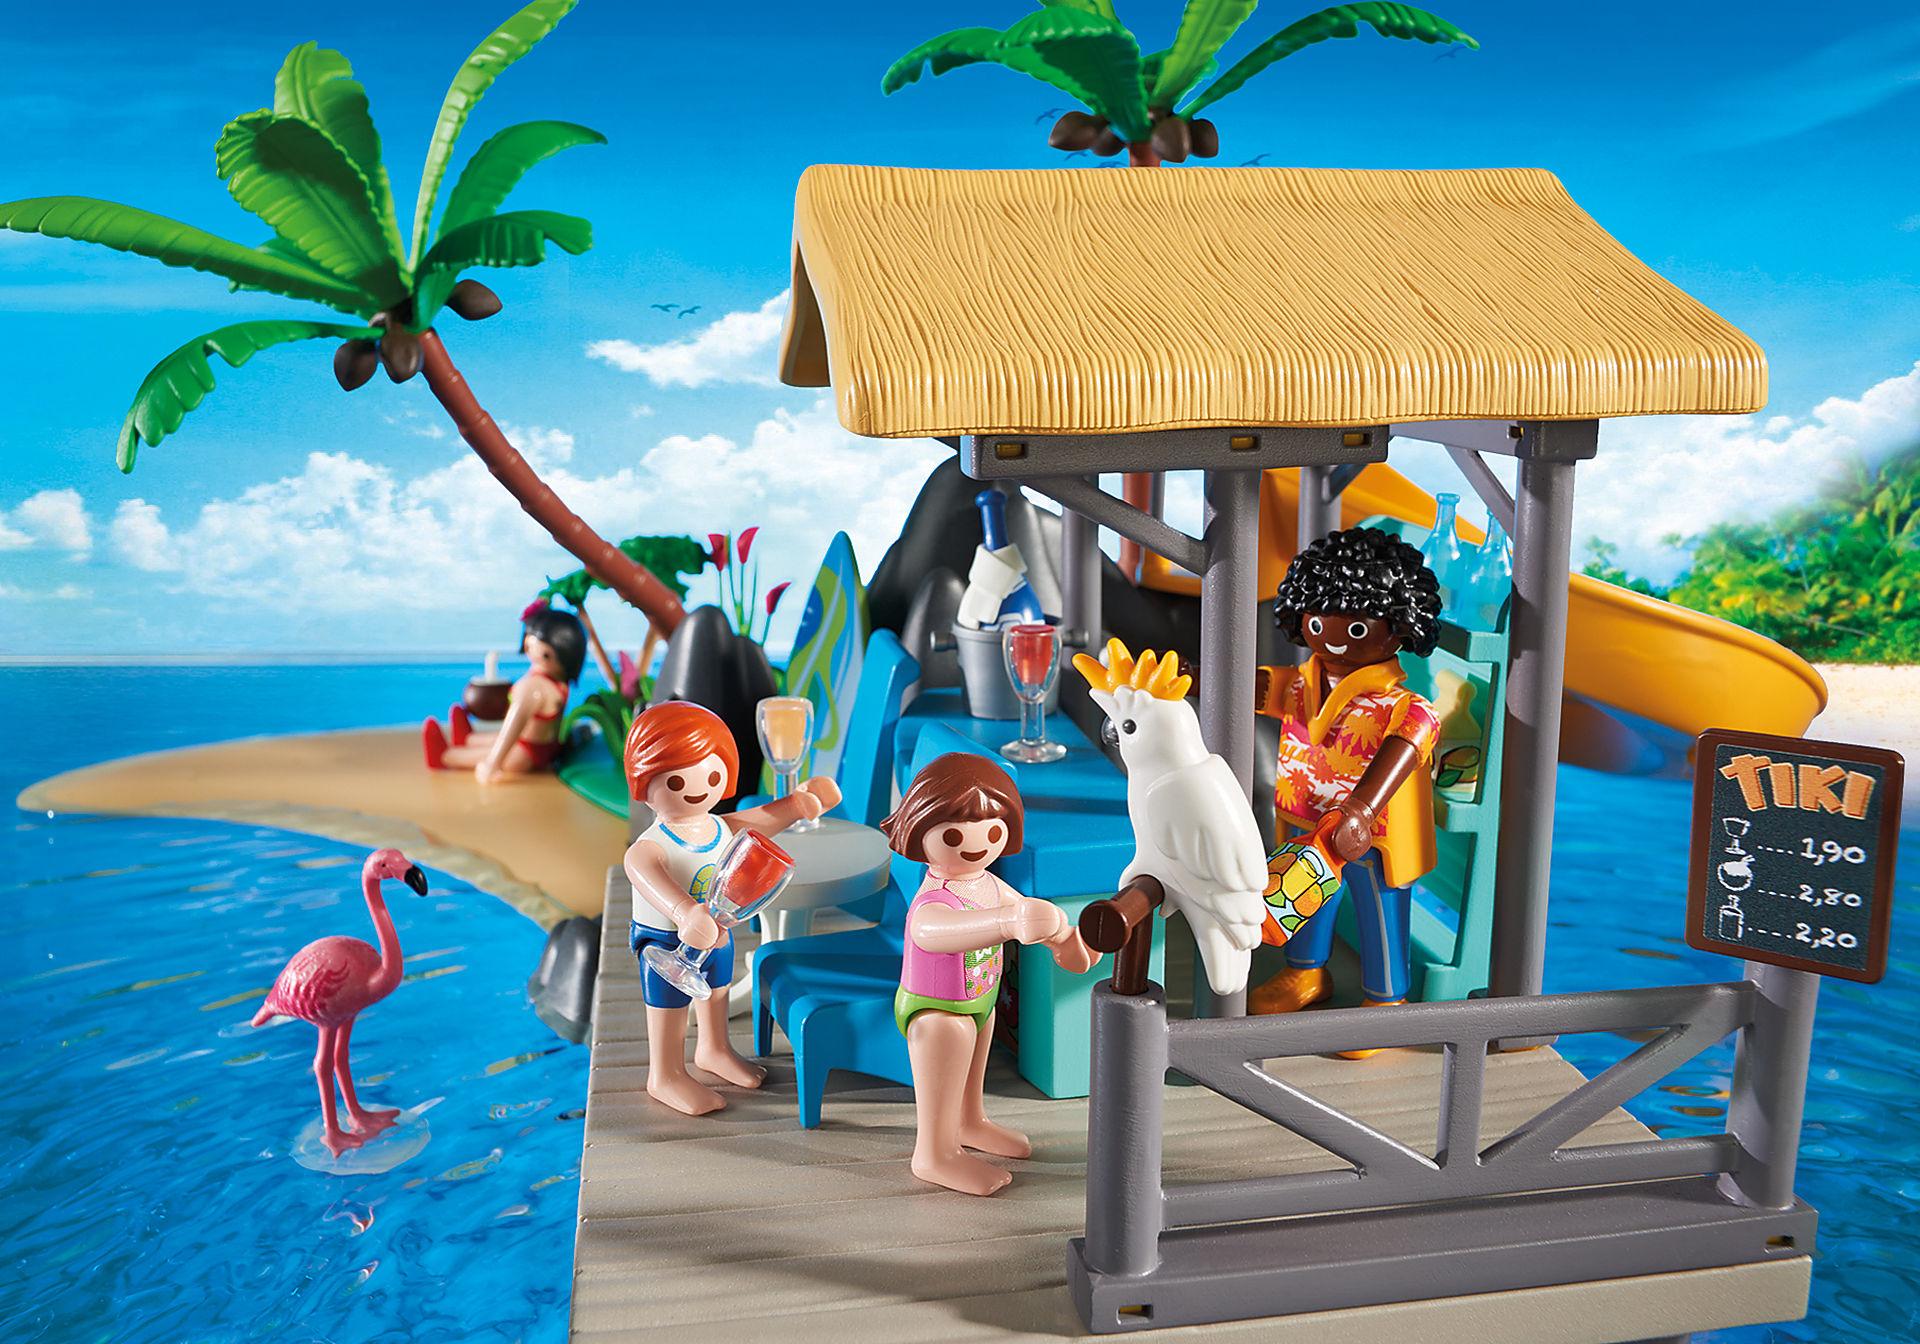 http://media.playmobil.com/i/playmobil/6979_product_extra2/Εξωτικό νησί με Beach Bar